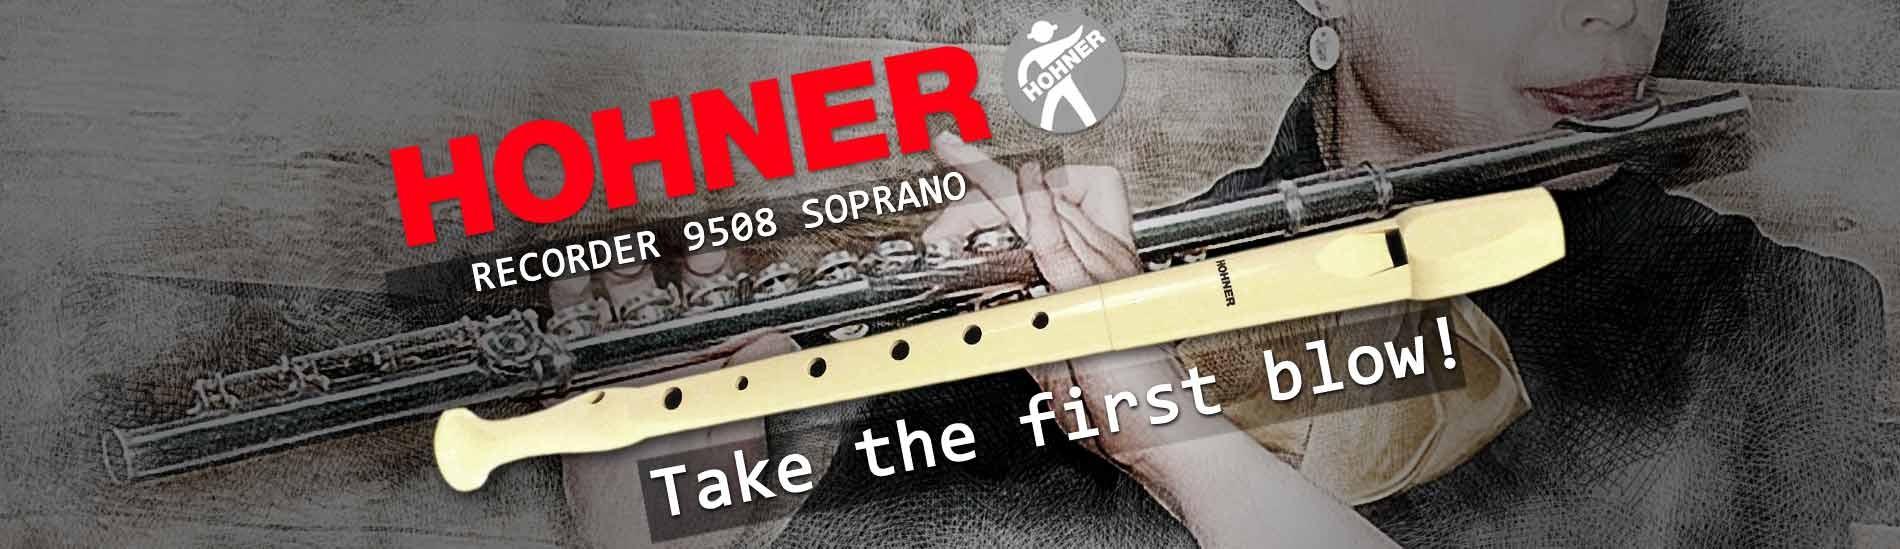 Hohner Soprano Recorder 9508